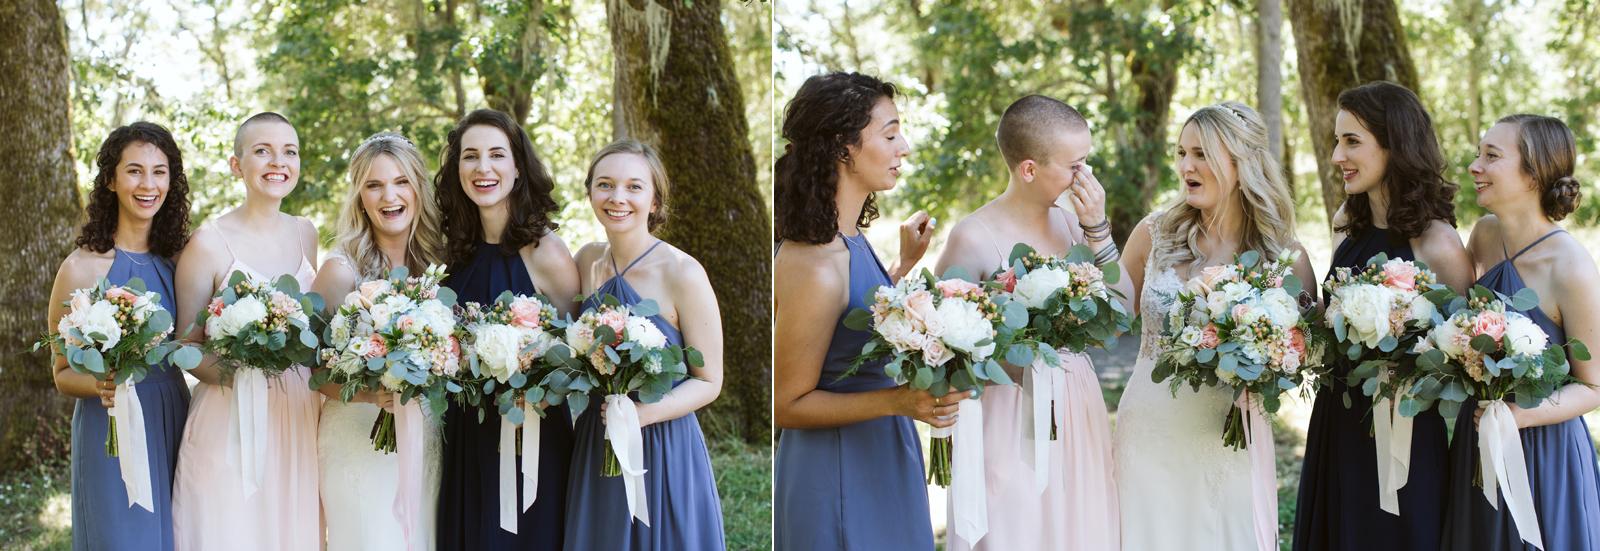 029-daronjackson-rachel-michael-wedding-mtpisgah.jpg